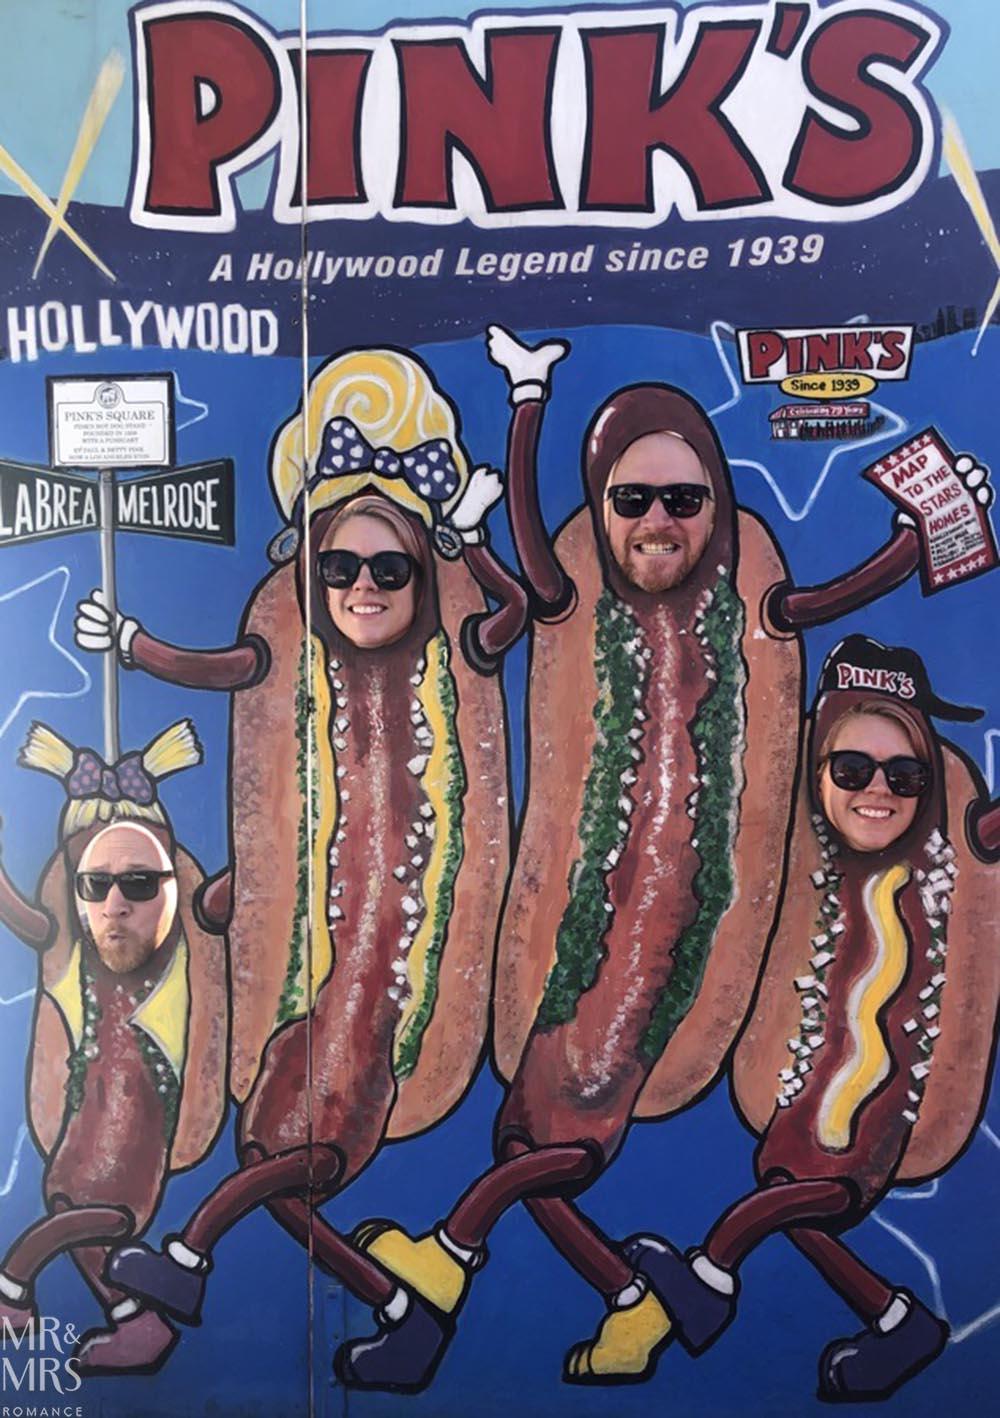 Pink's hotdogs, LA